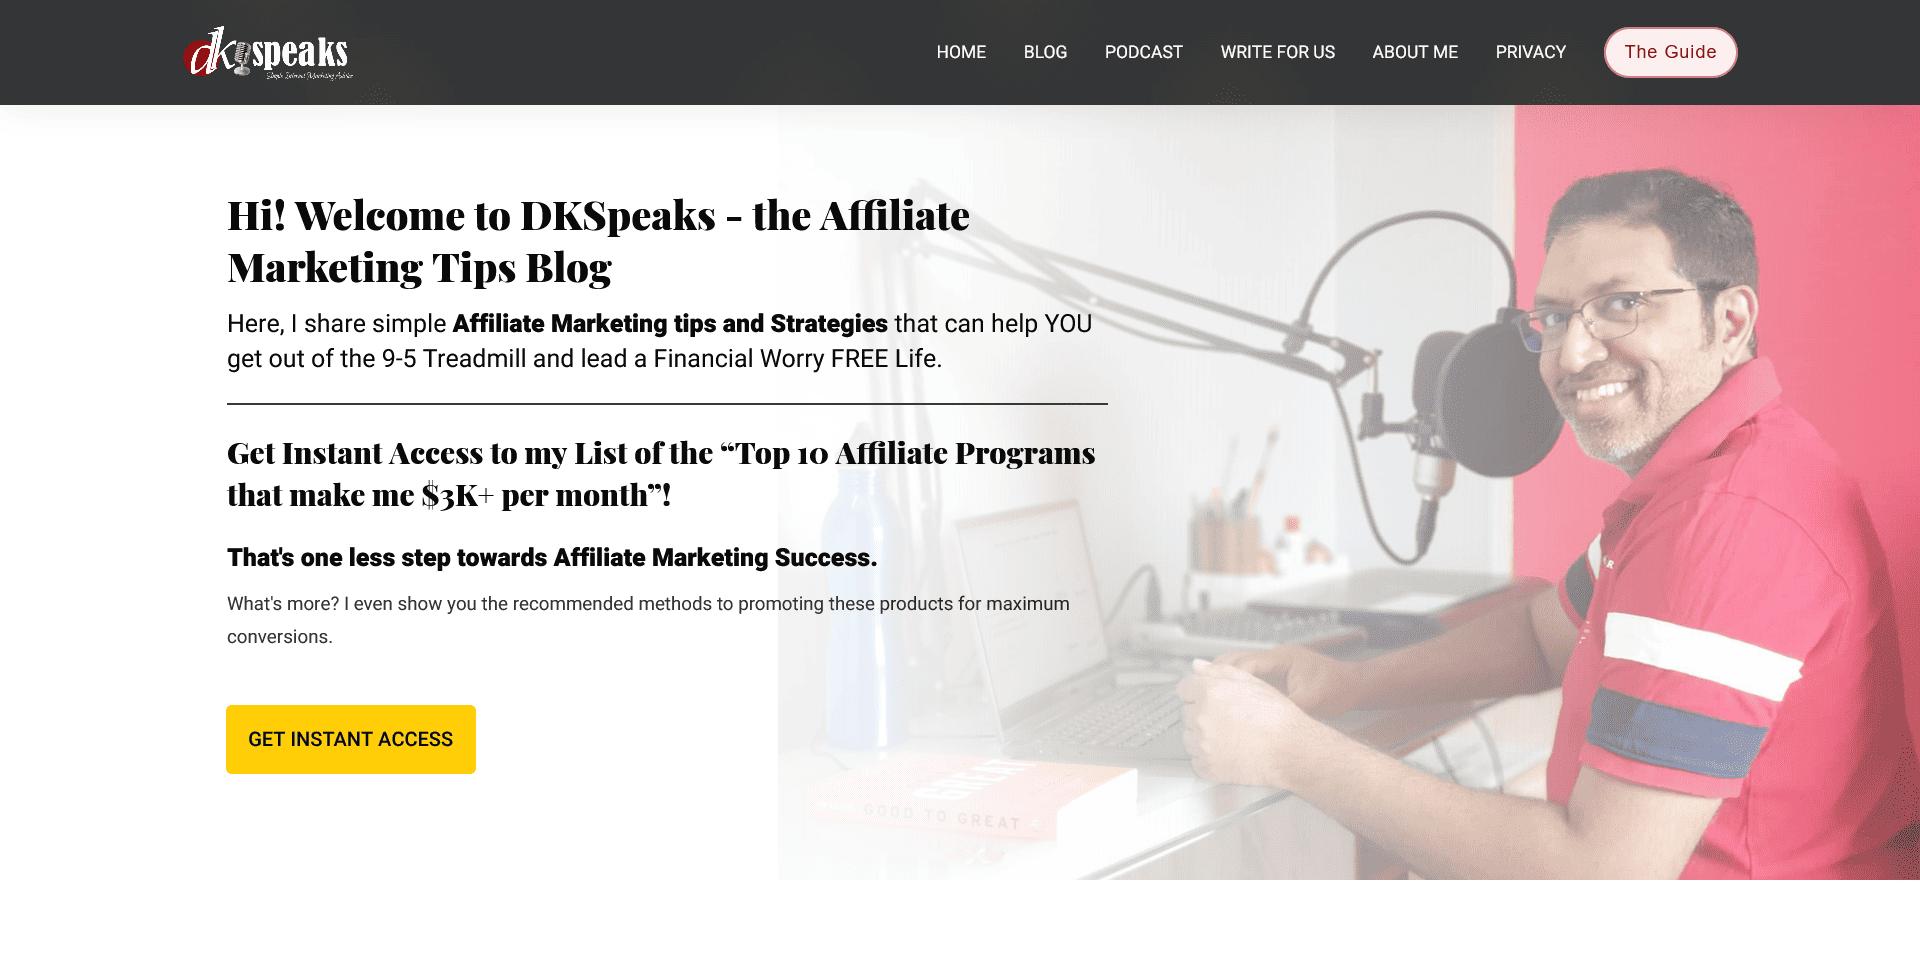 dkspeaks.com